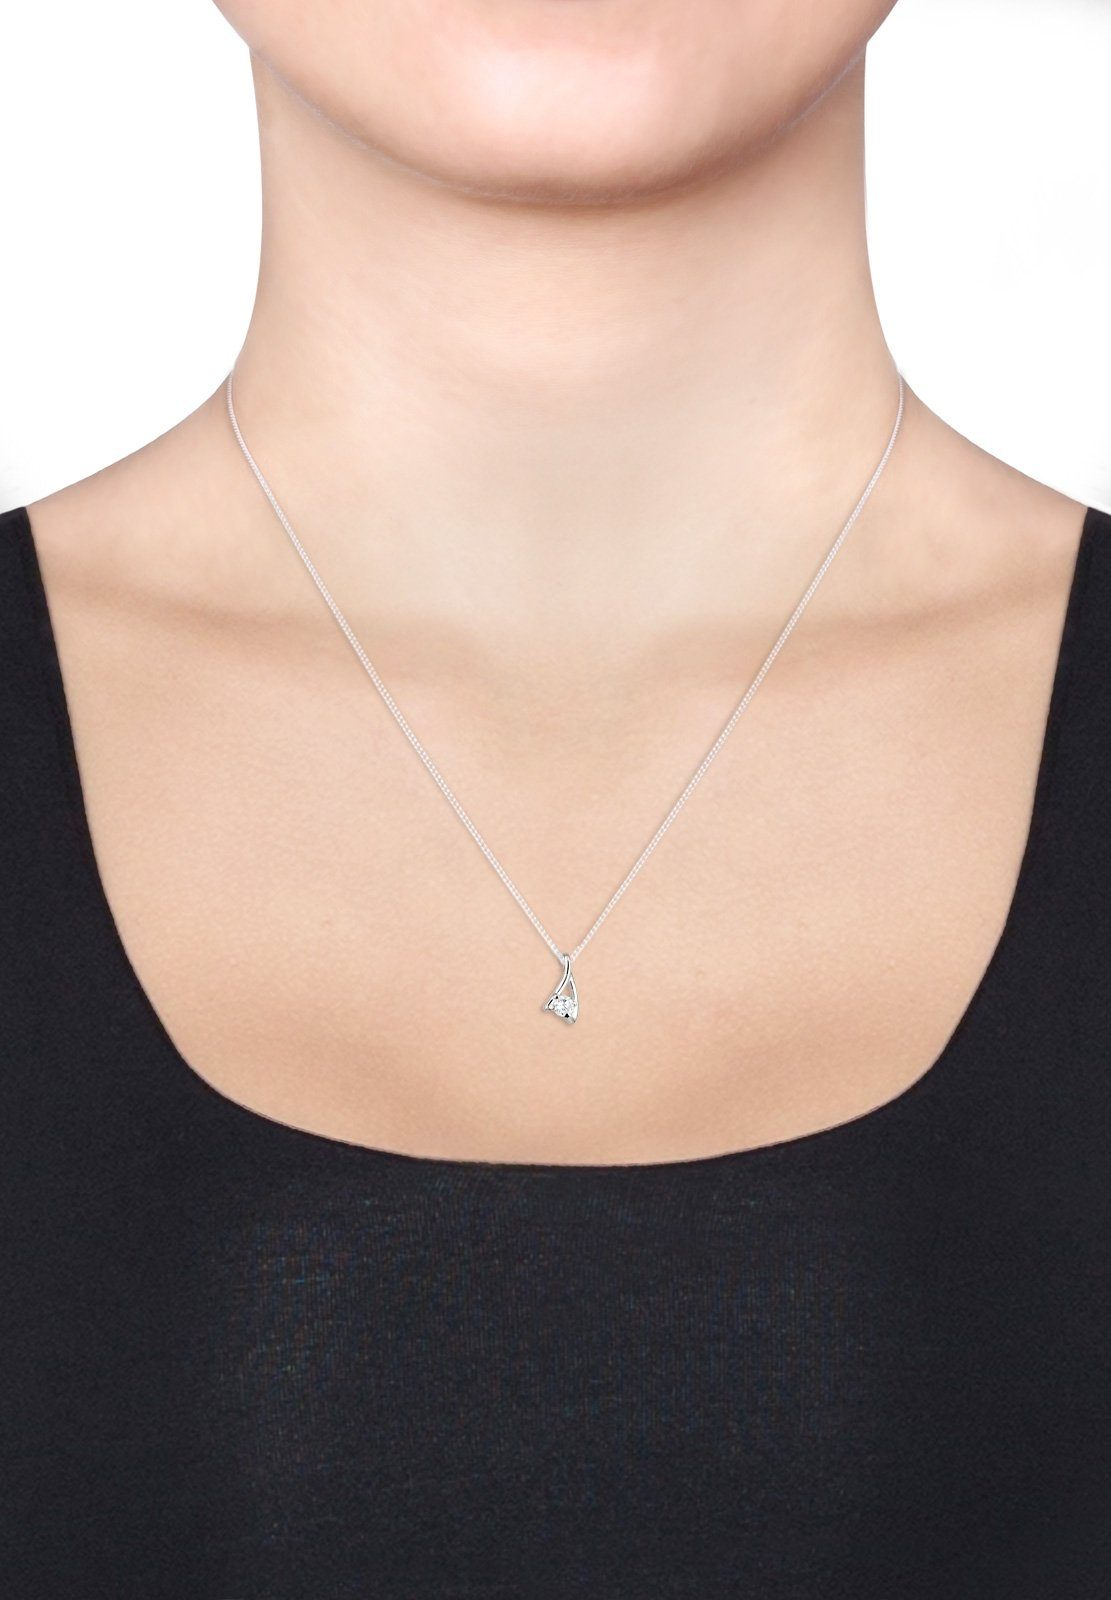 Elli Silber« Klassisch Zirkonia 925 Online Halskette Kaufen »solitär PZOkuXi